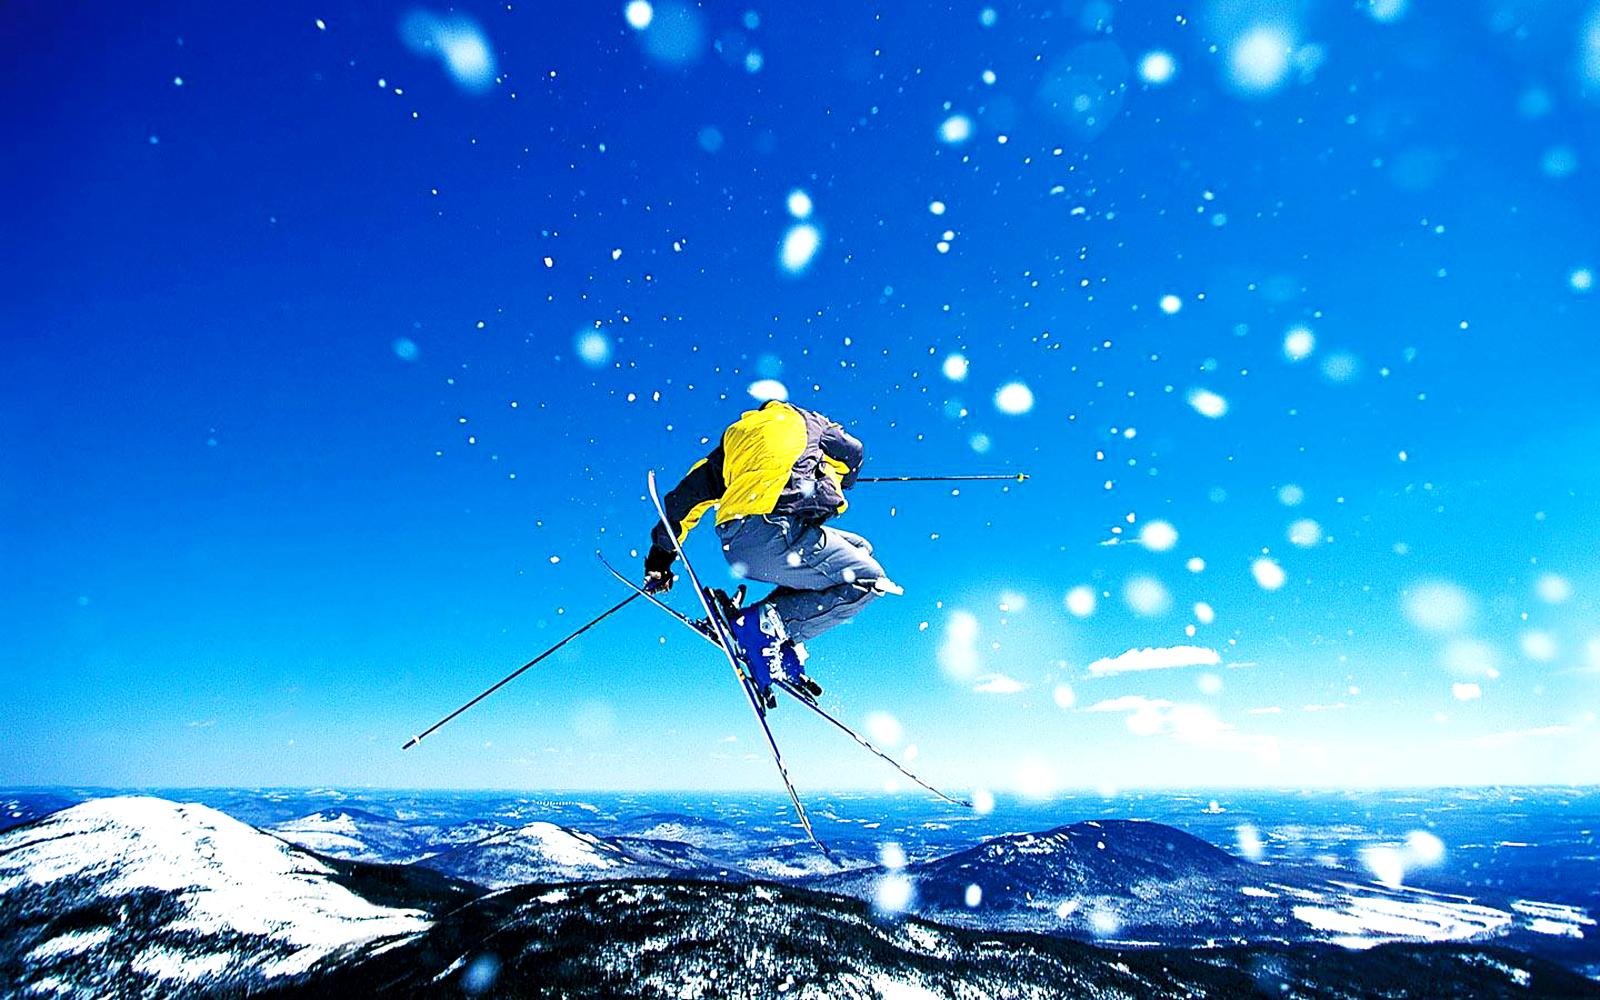 Skiing Winter Sports HD Wallpapers | Desktop Wallpapers